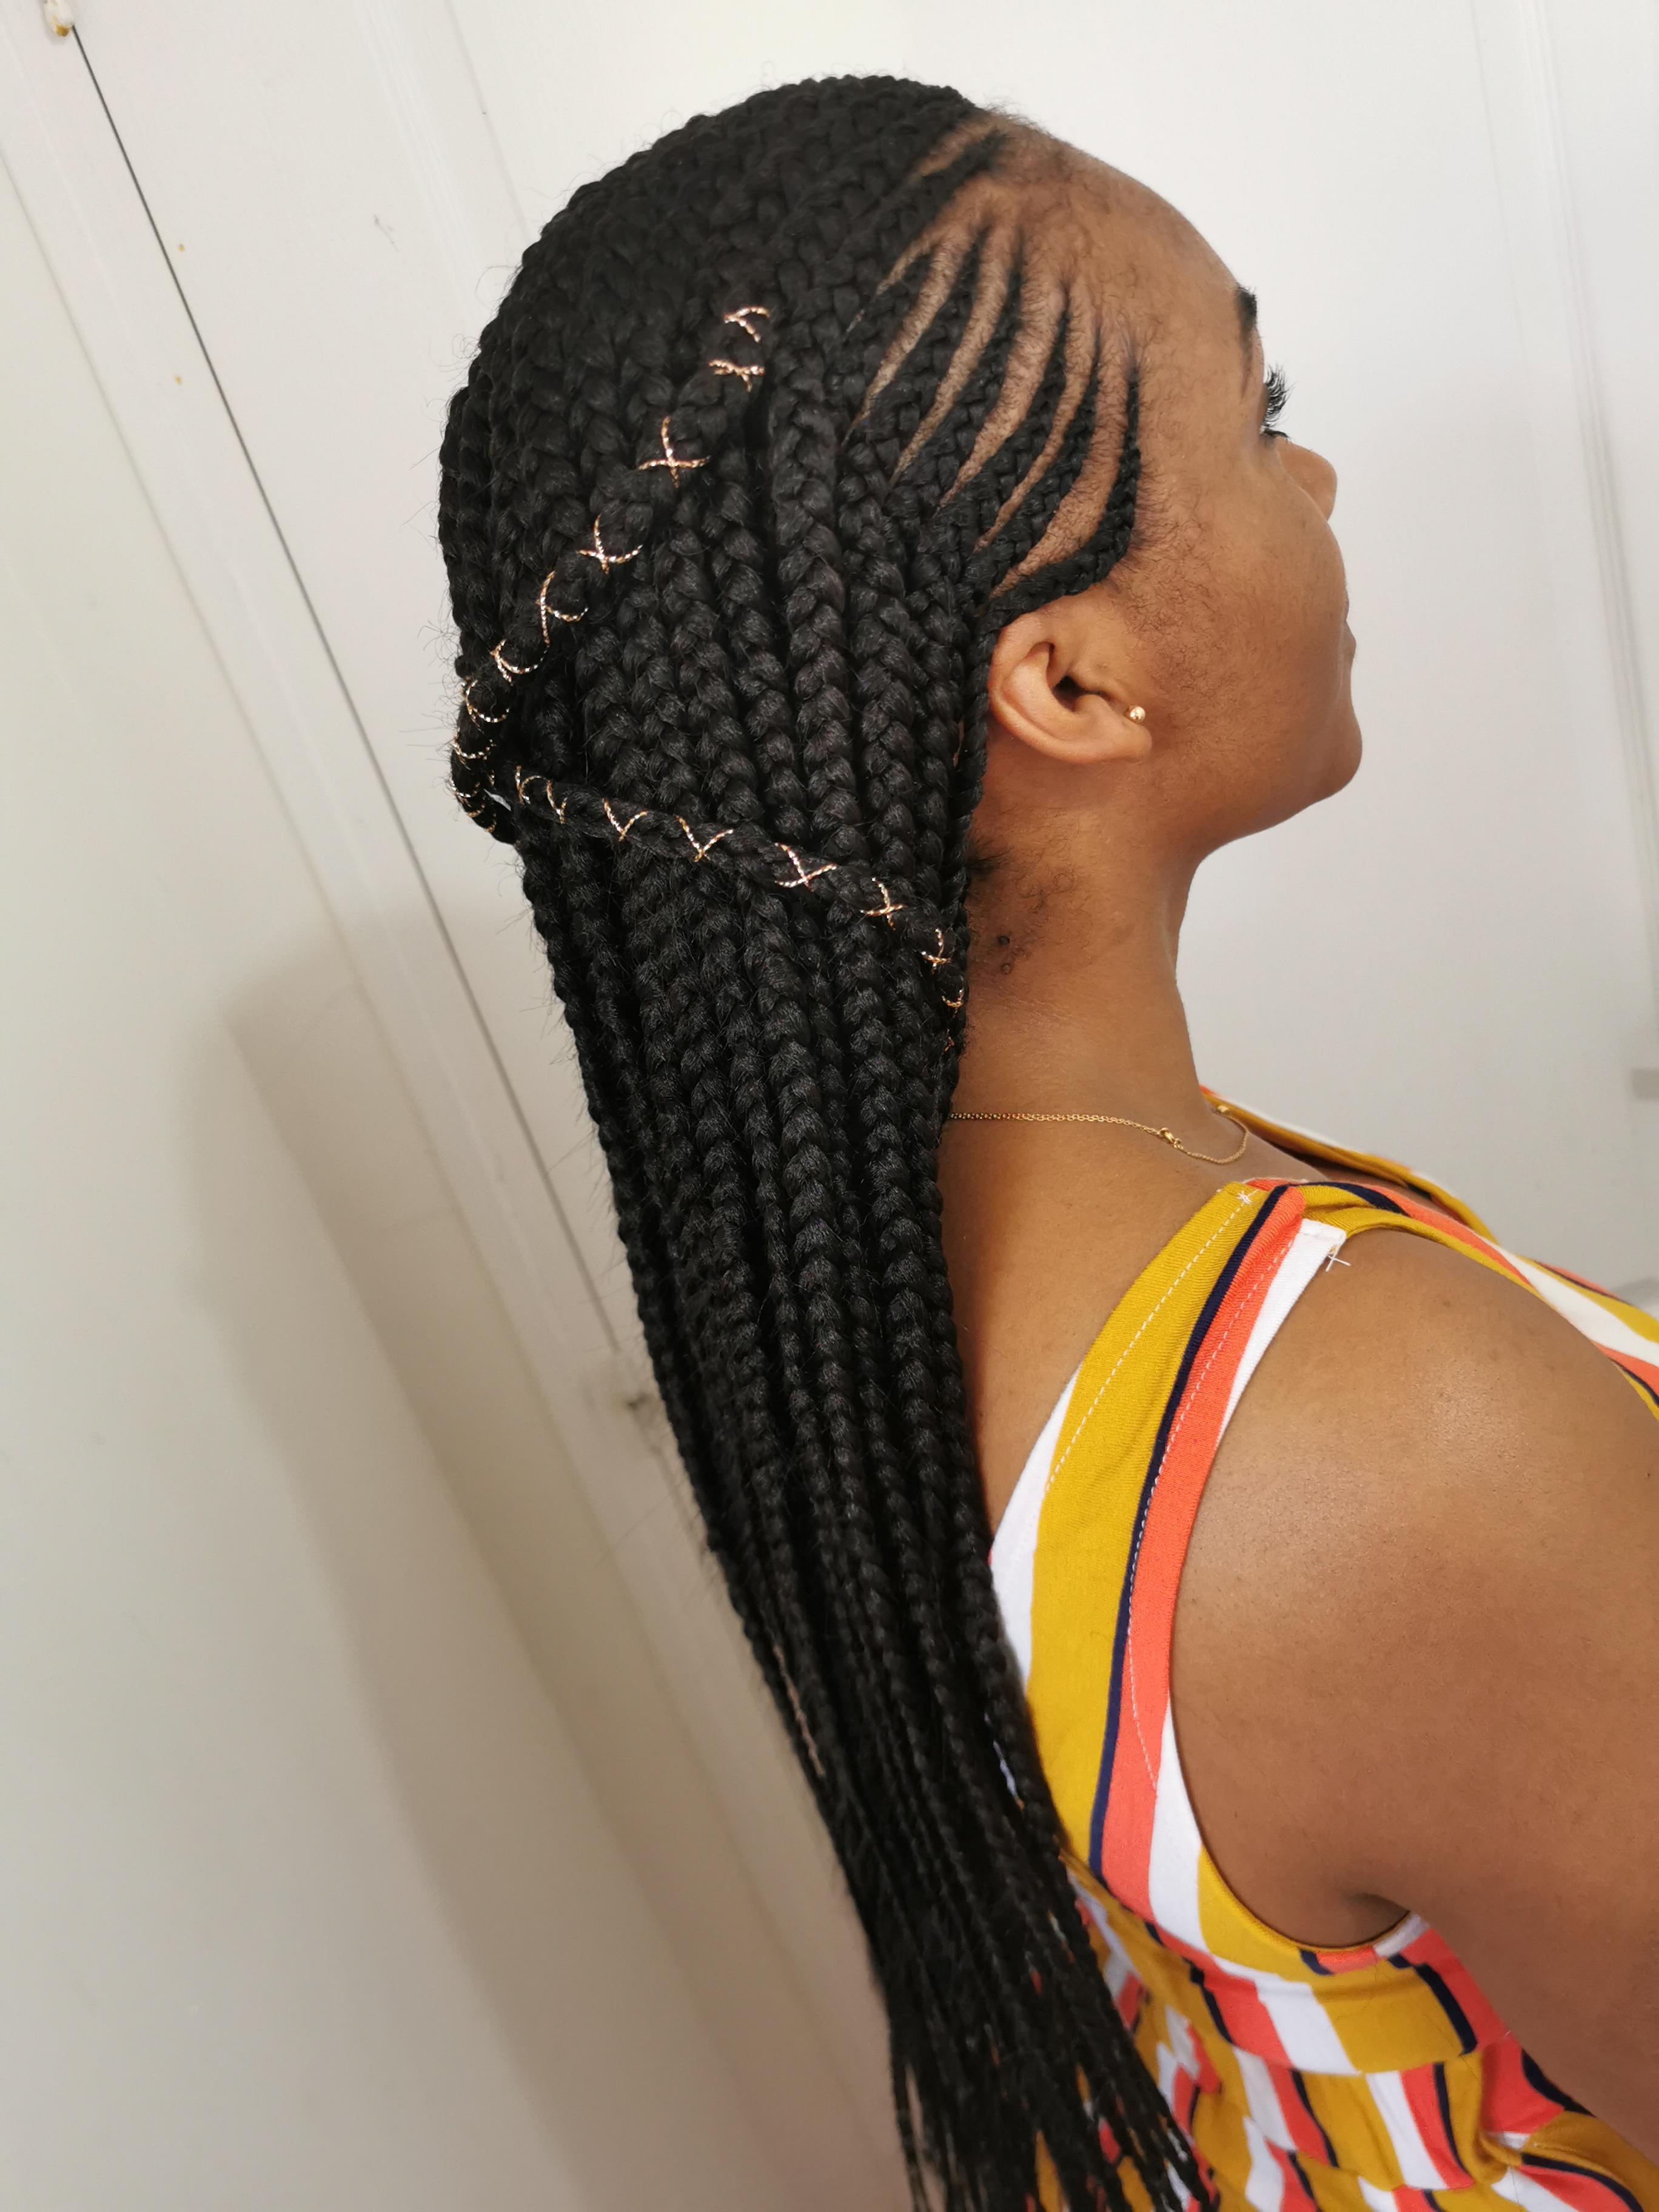 salon de coiffure afro tresse tresses box braids crochet braids vanilles tissages paris 75 77 78 91 92 93 94 95 BQLXJOOS